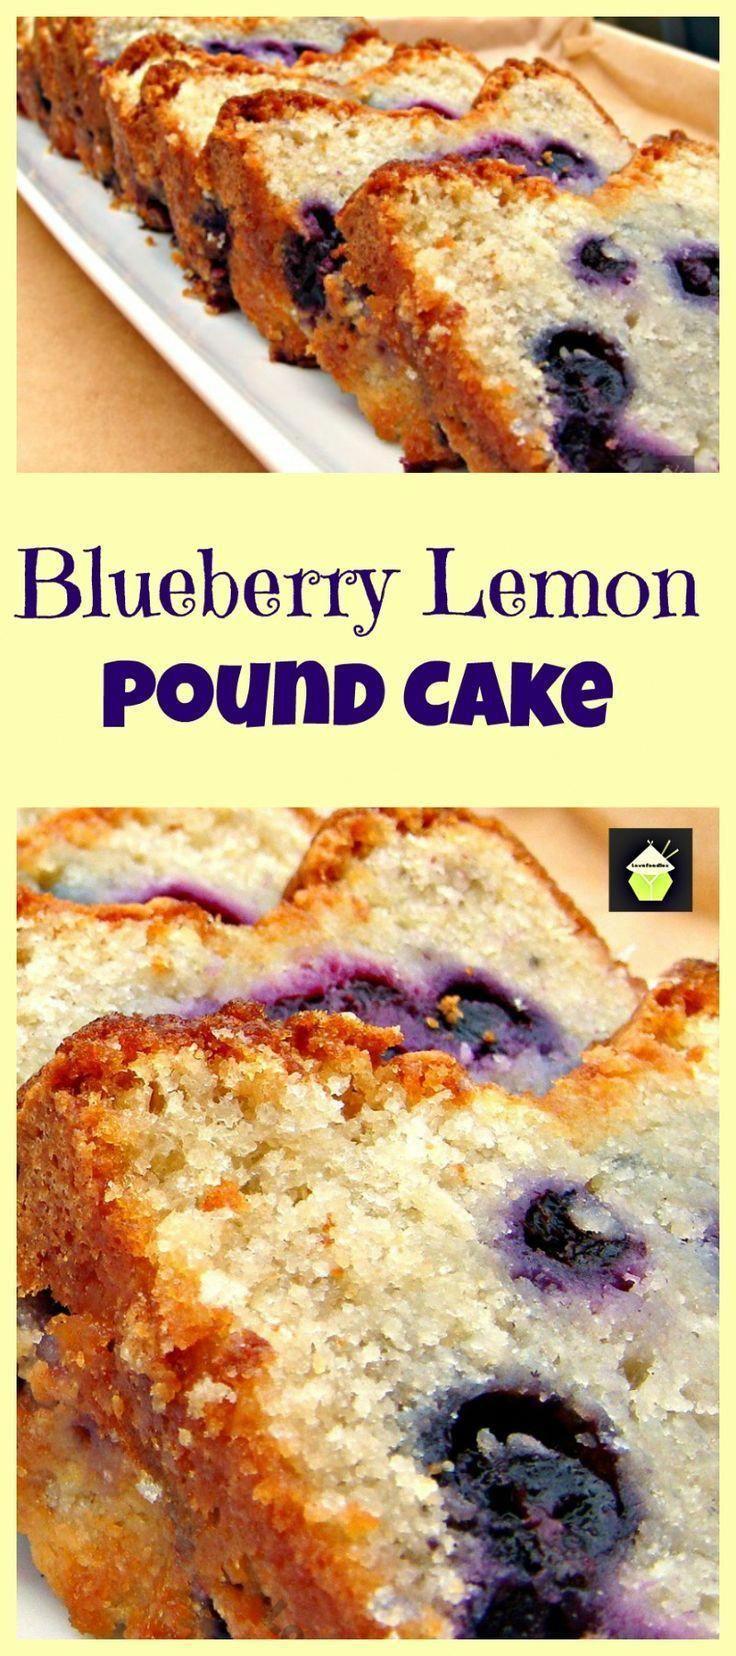 Blueberry lemon pound cakereally delicious poundcake